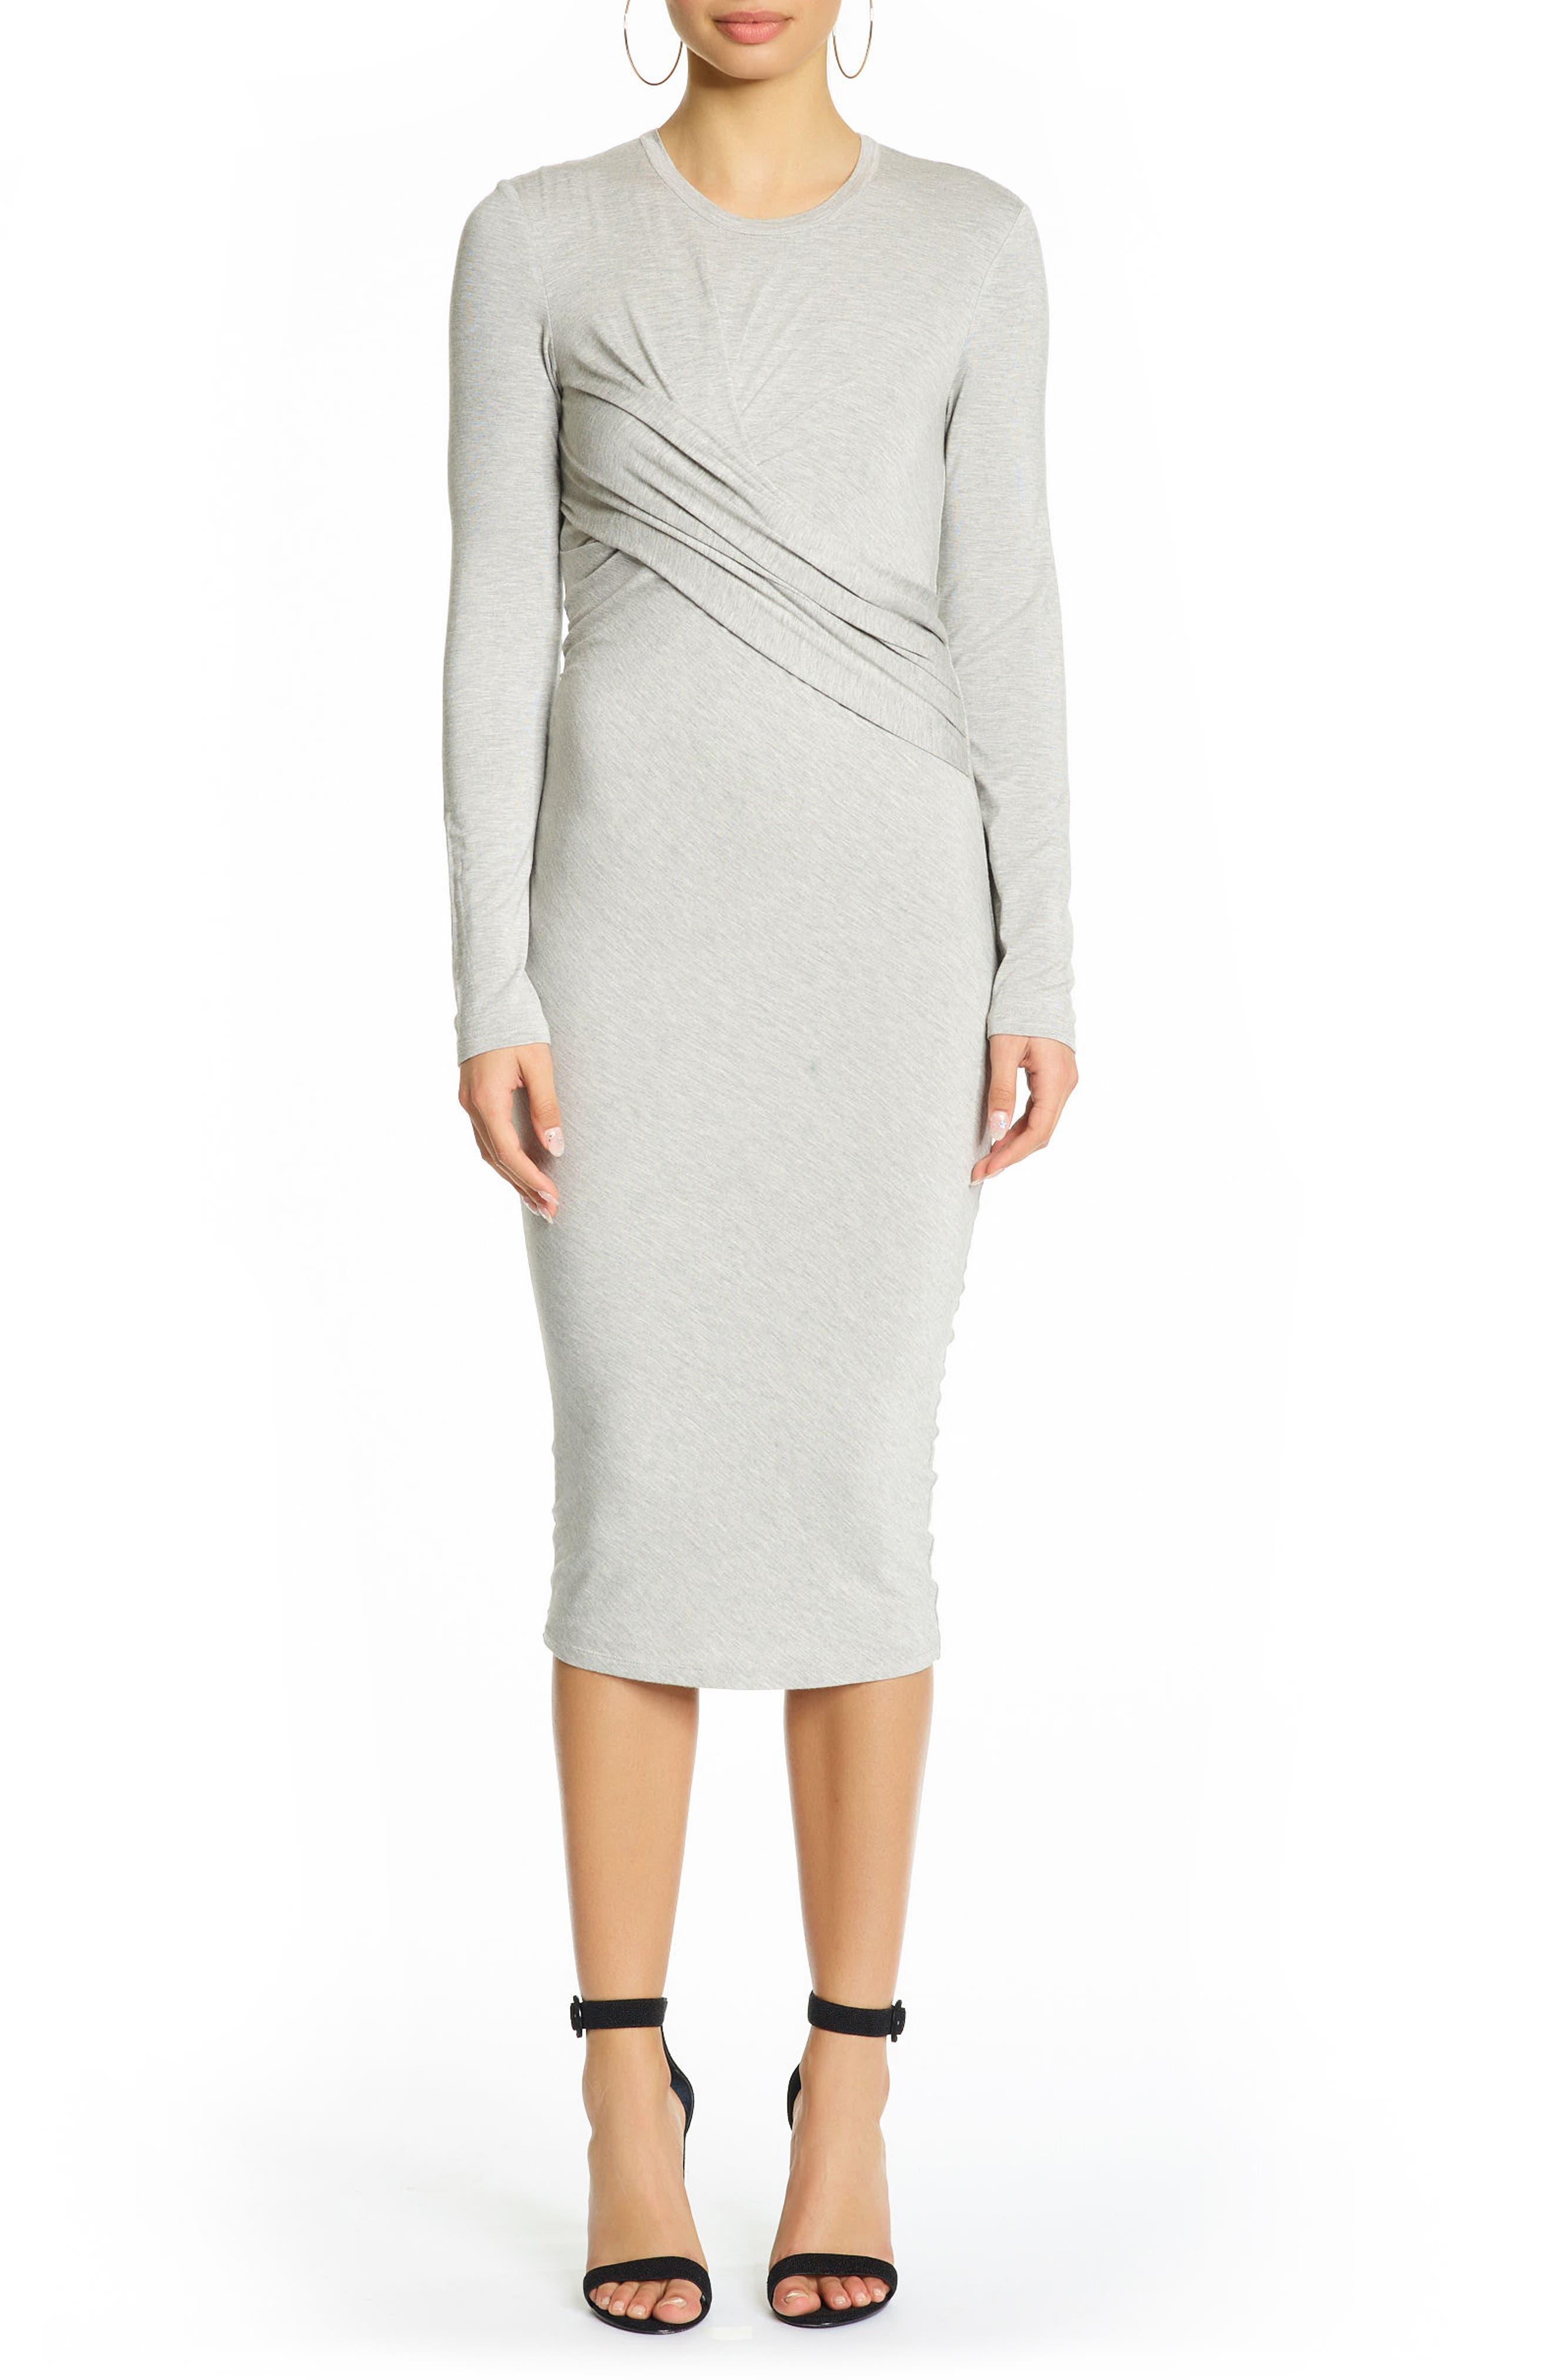 Main Image - KENDALL + KYLIE Long Sleeve Twist Dress